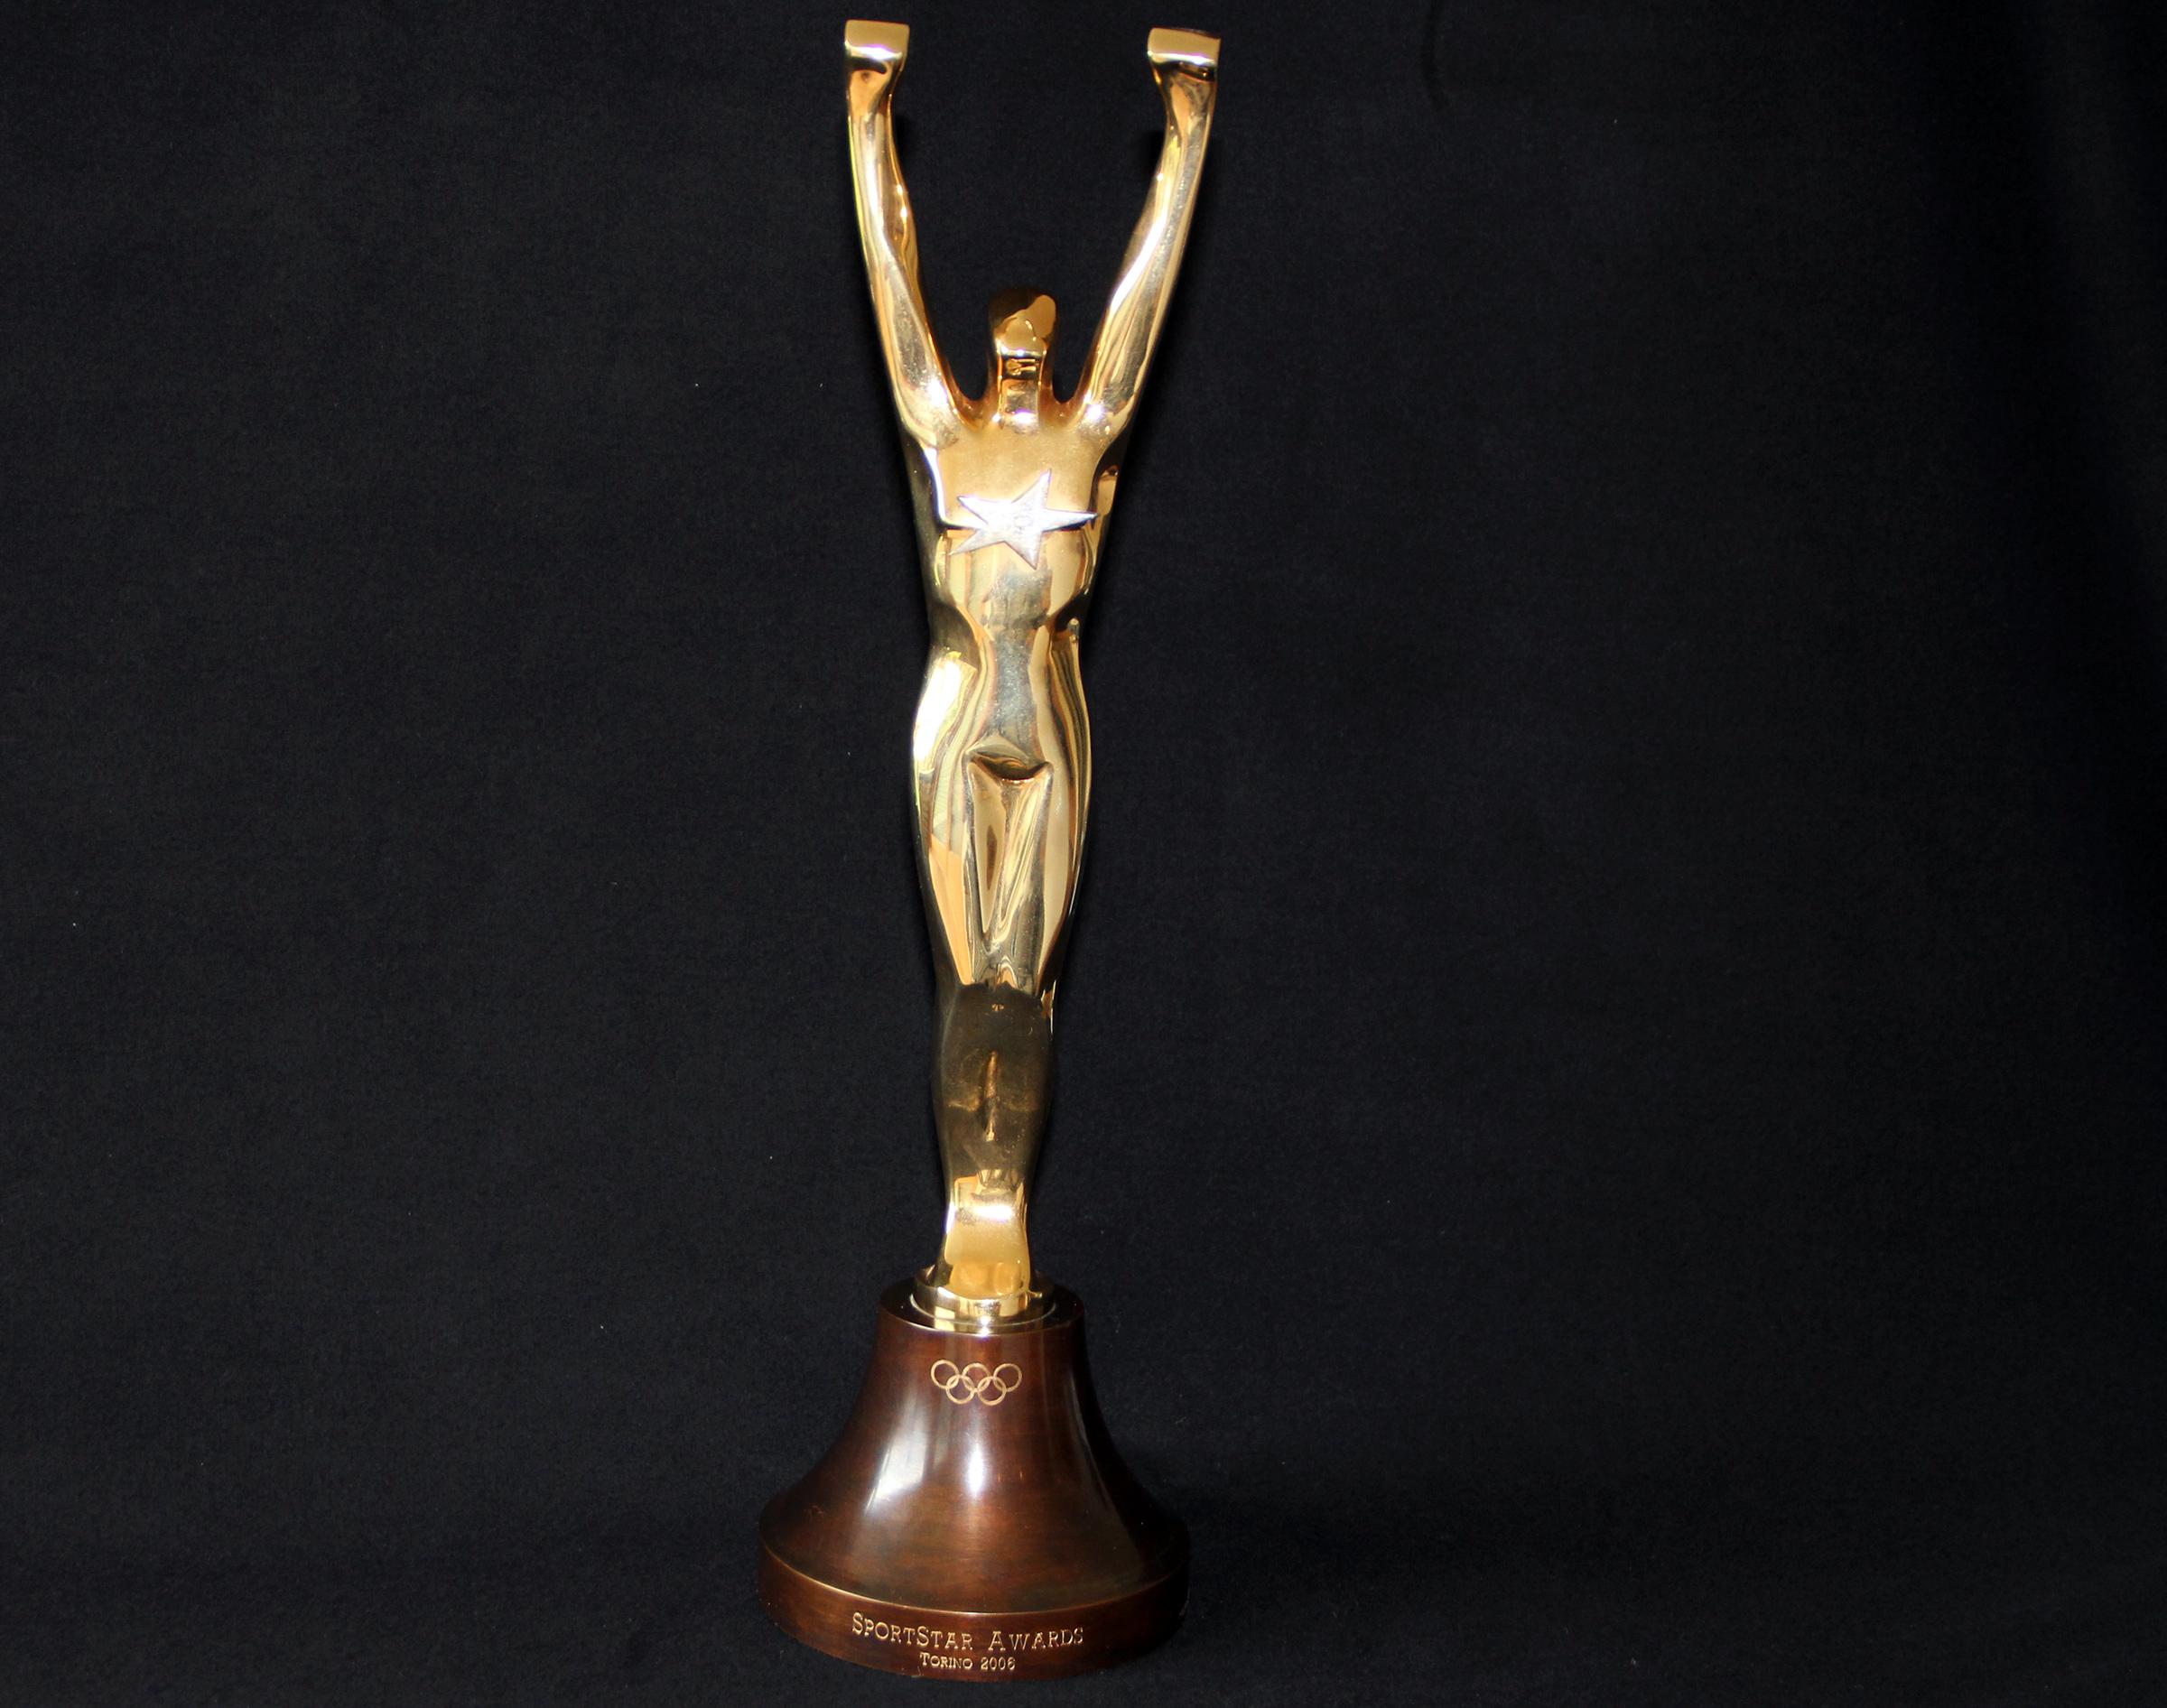 Eurosport Sportstar Award